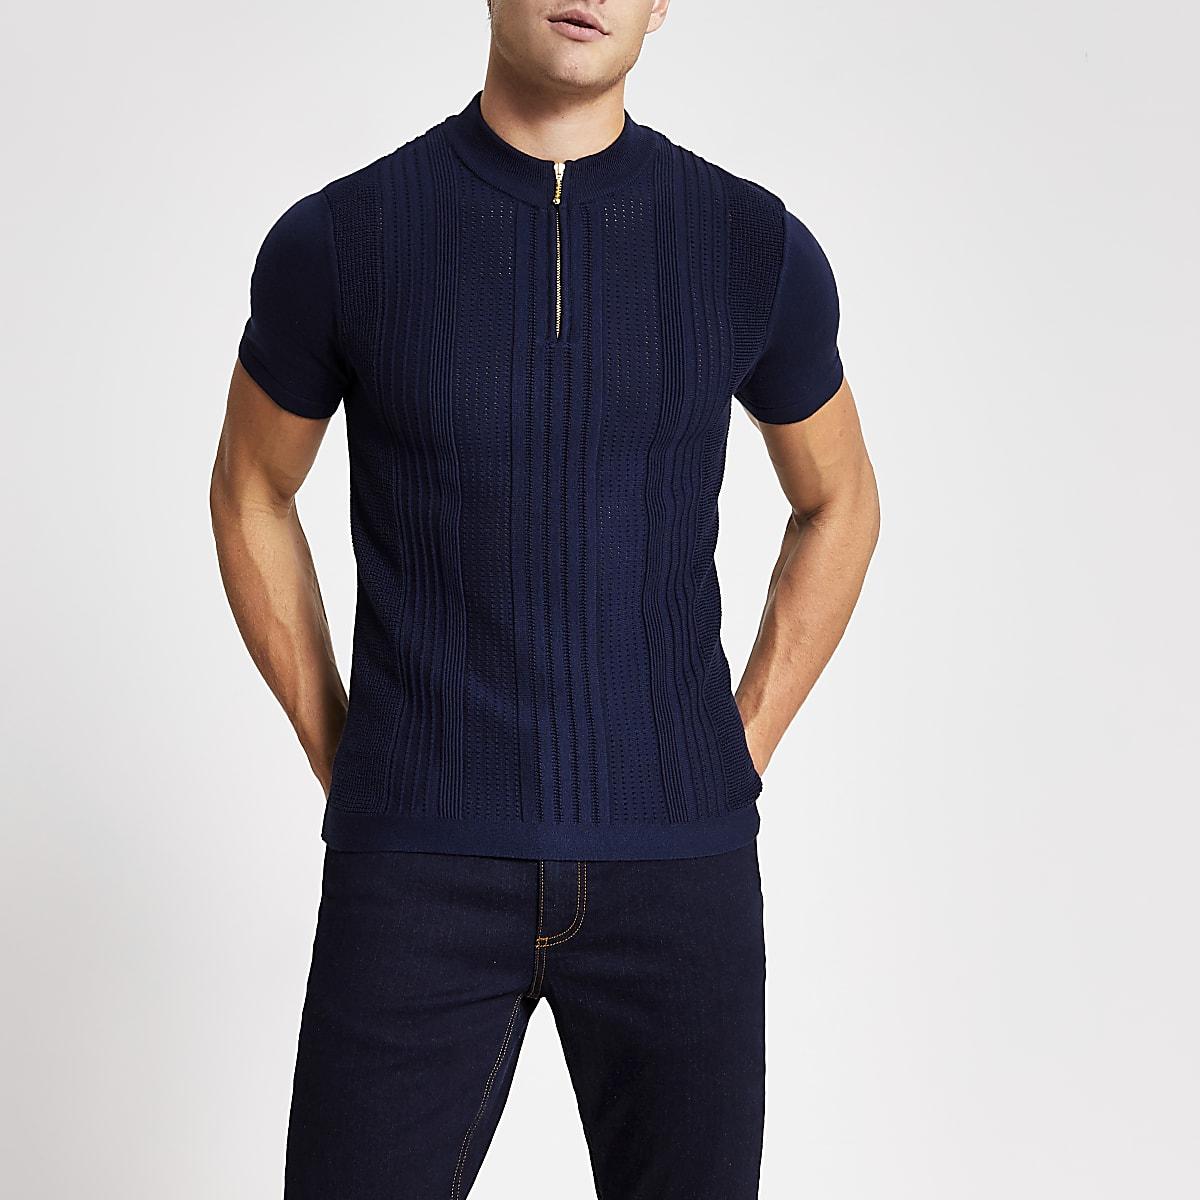 Navy slim fit half zip knitted T-shirt